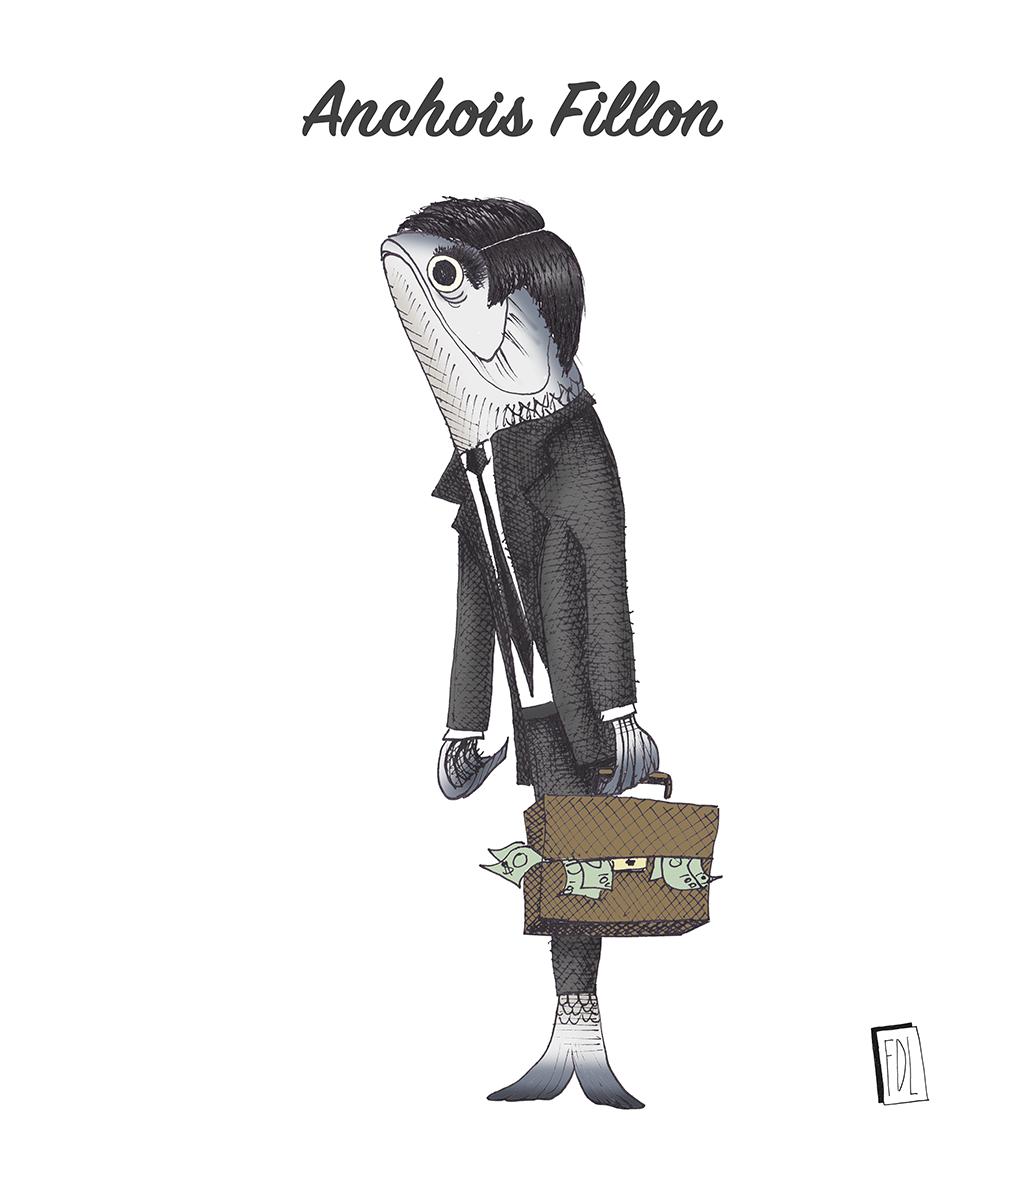 ANCHOIS FILLON